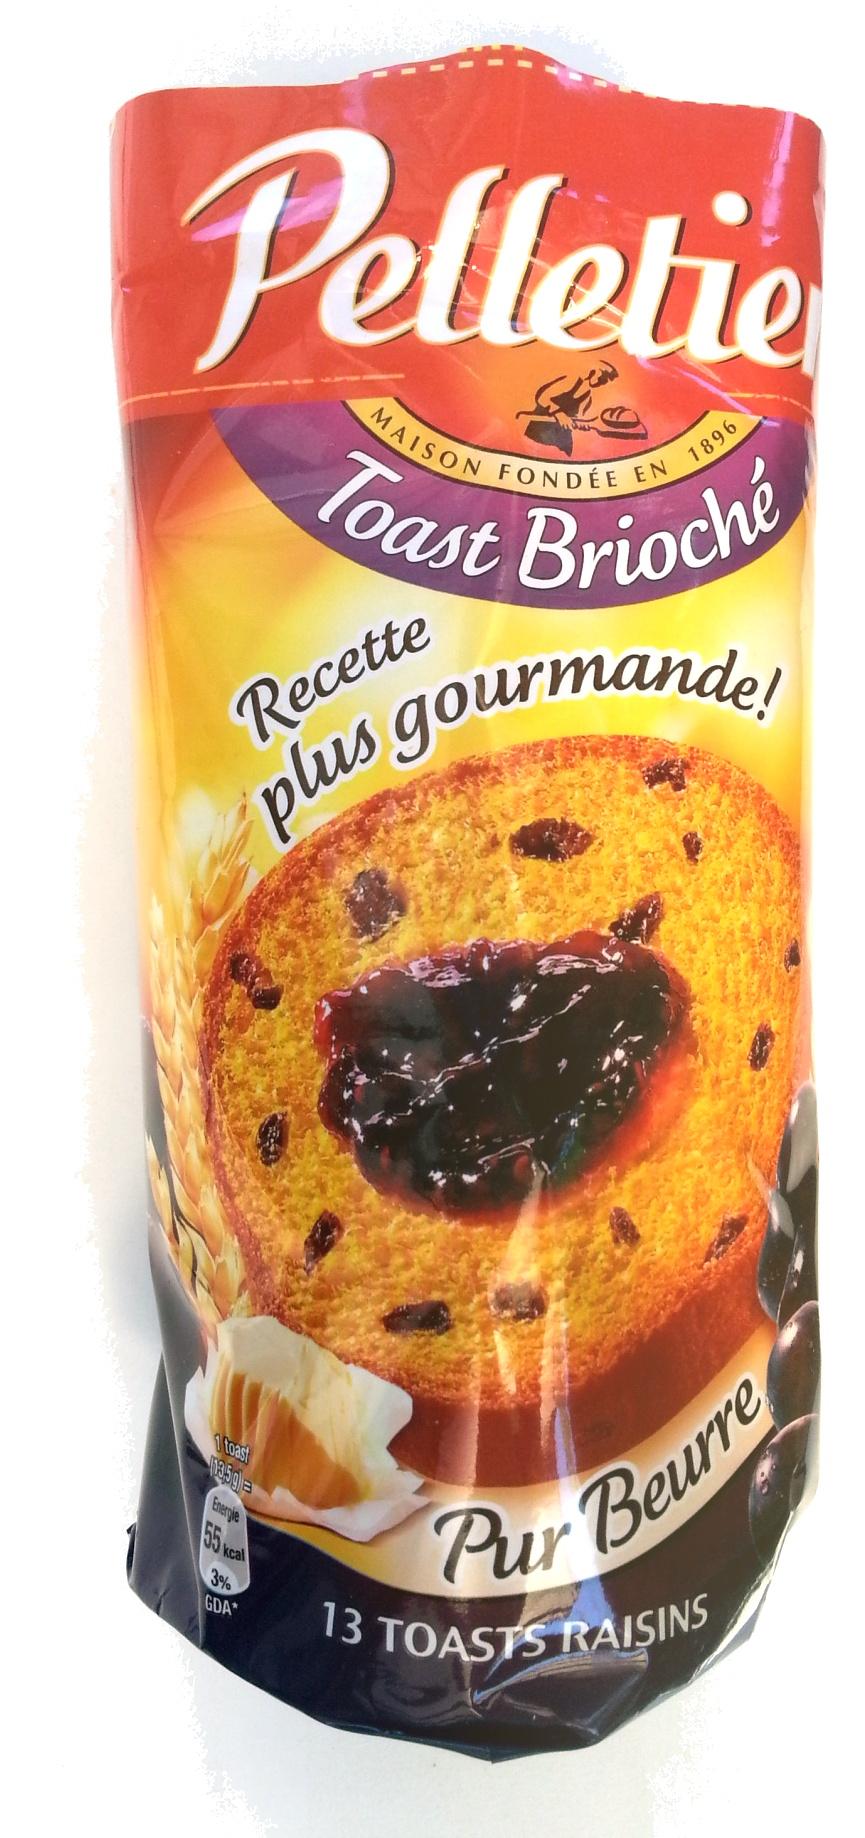 Toast Brioché Raisins - Product